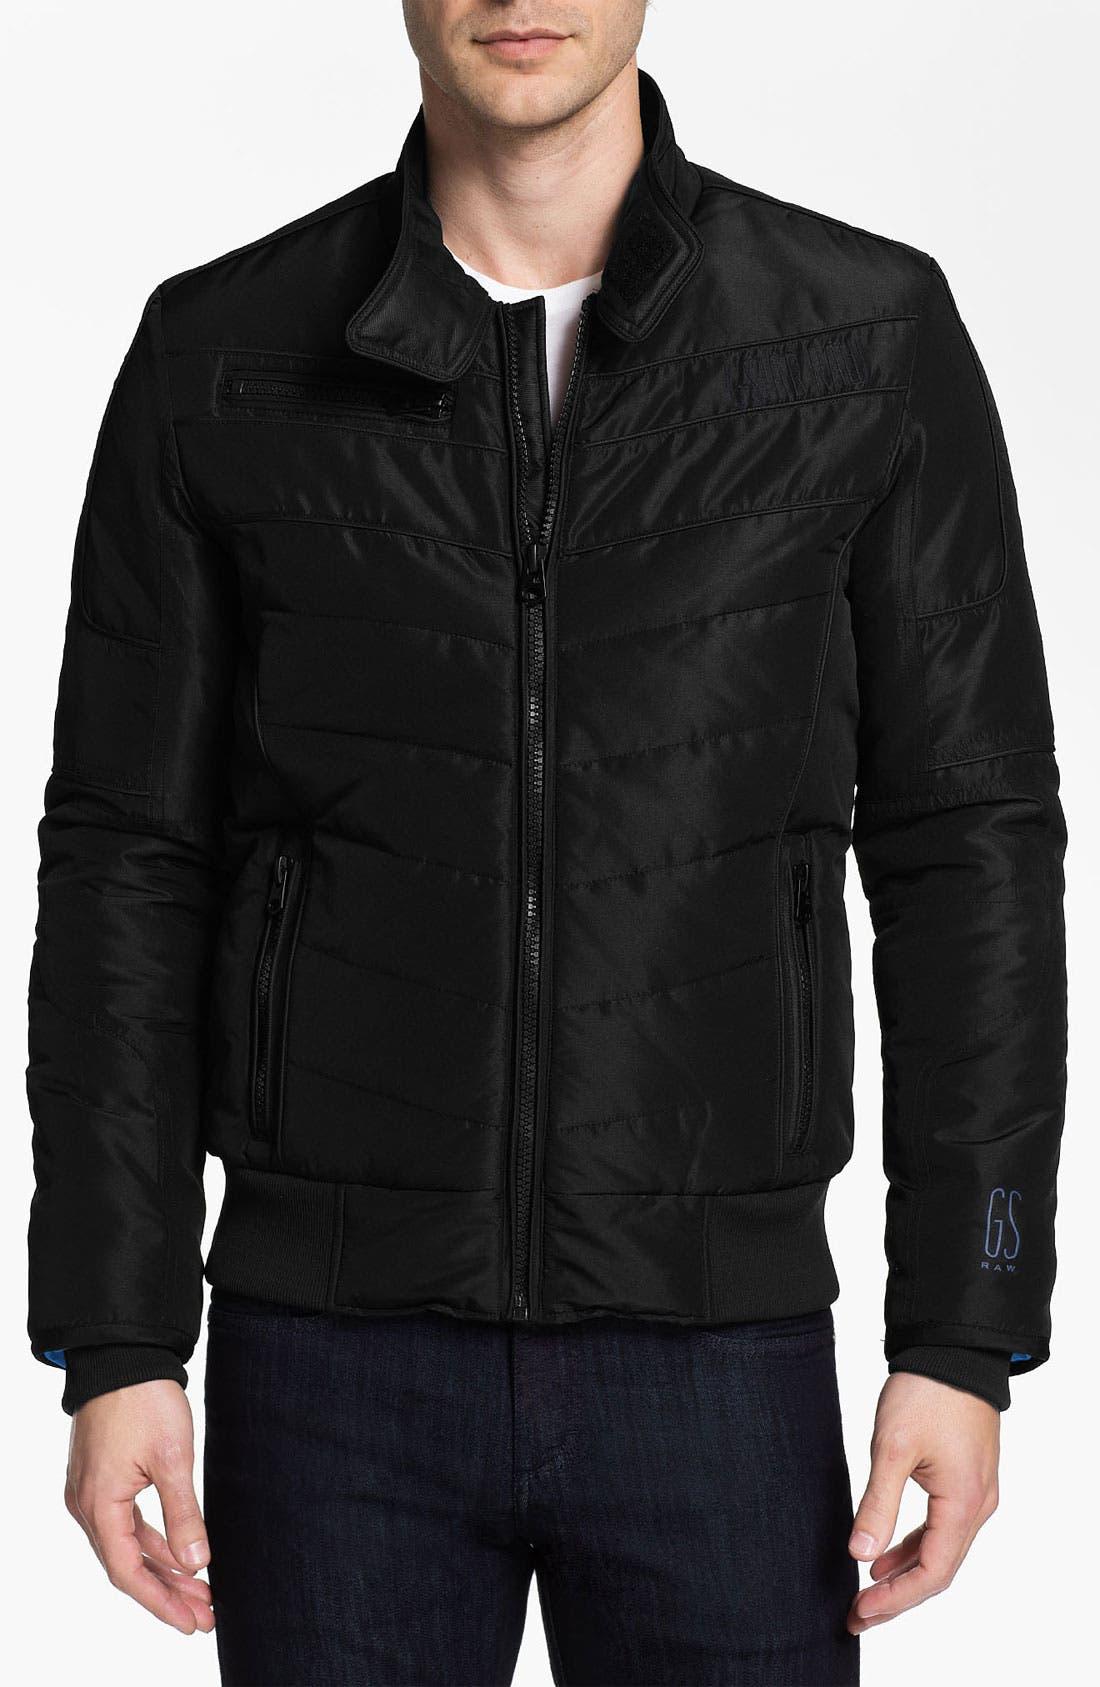 Main Image - G-Star Raw 'Mortiz' Quilted Moto Jacket